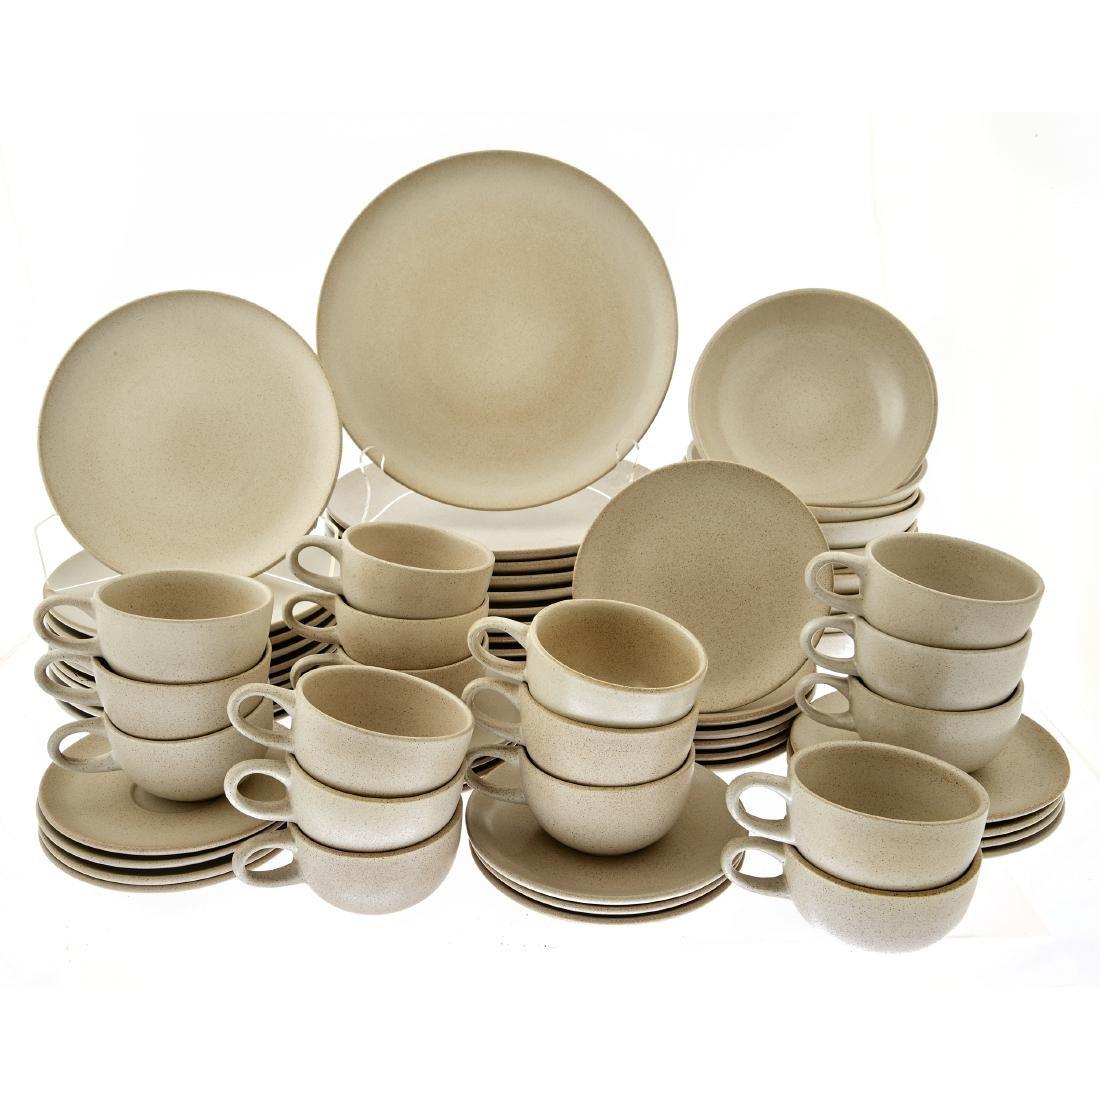 Heath Ceramics partial table service